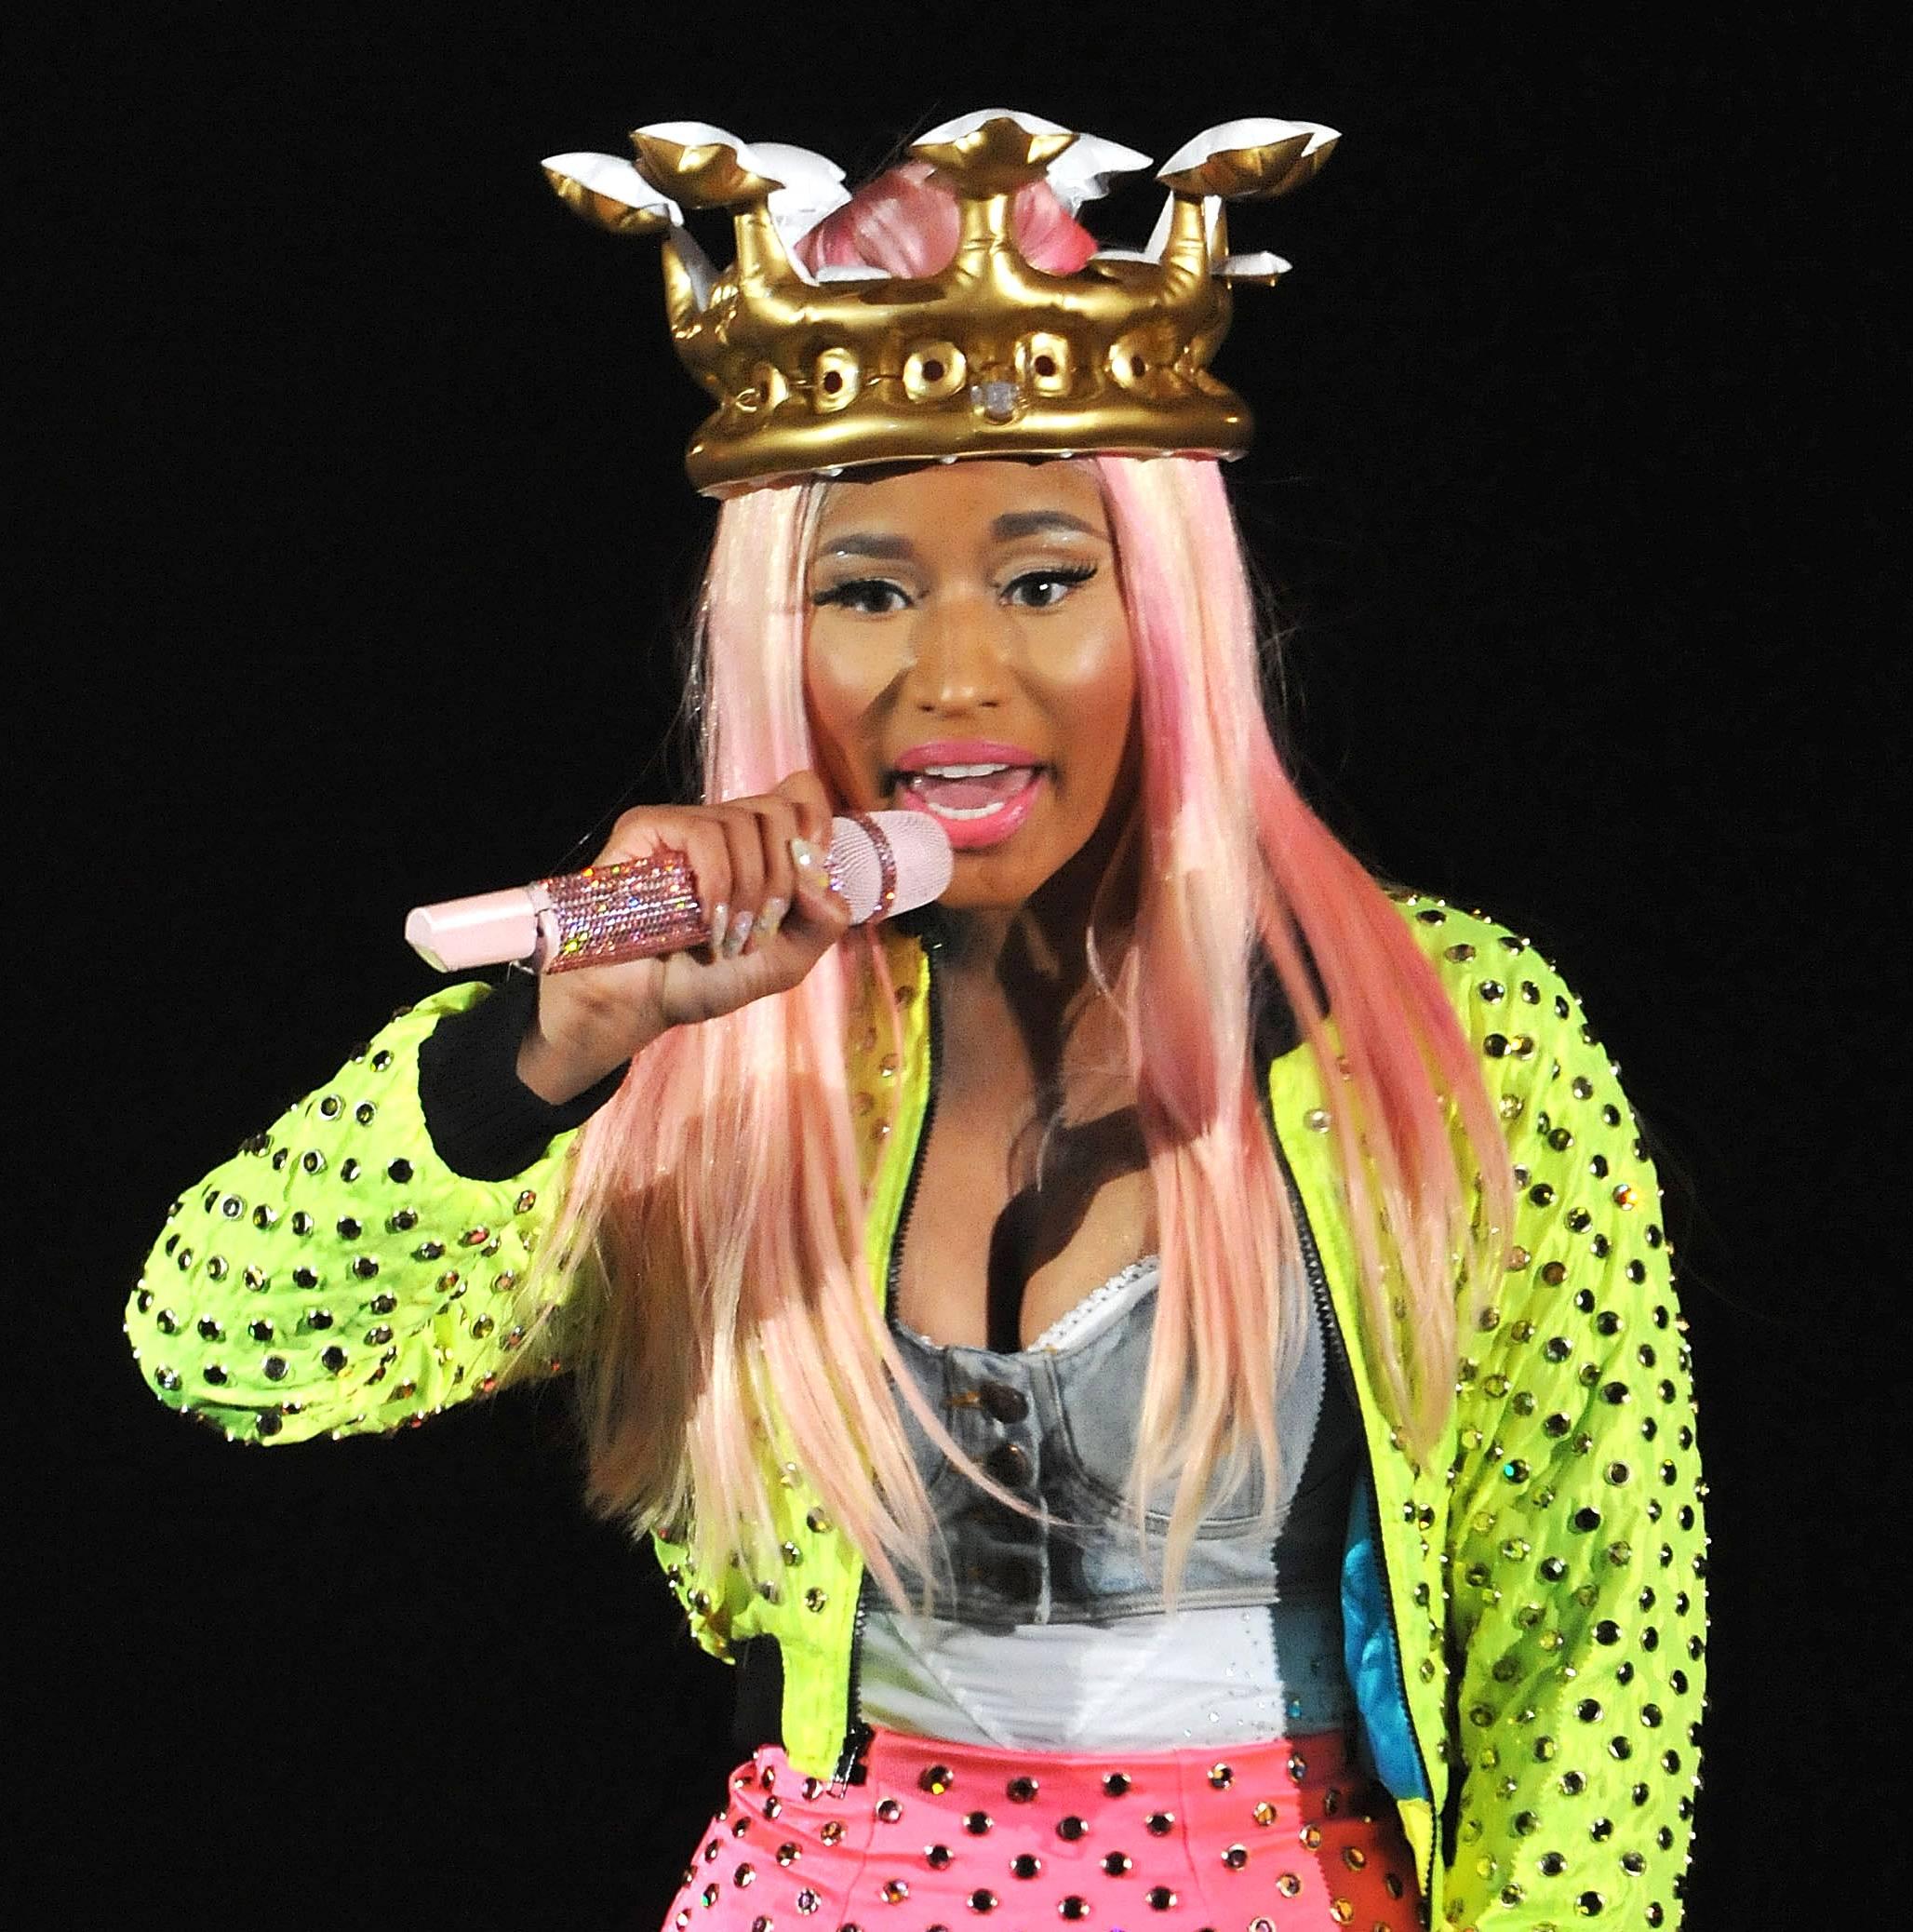 "Nicki Minaj @NICKIMINAJ - Tweet: ""I heard we made billboard history today with Starships!!!! :)""The rap pop star celebrates twenty-one consecutive weeks on the Billboard Top 10.(Photo: Jim Dyson/Redferns via Getty Images)"